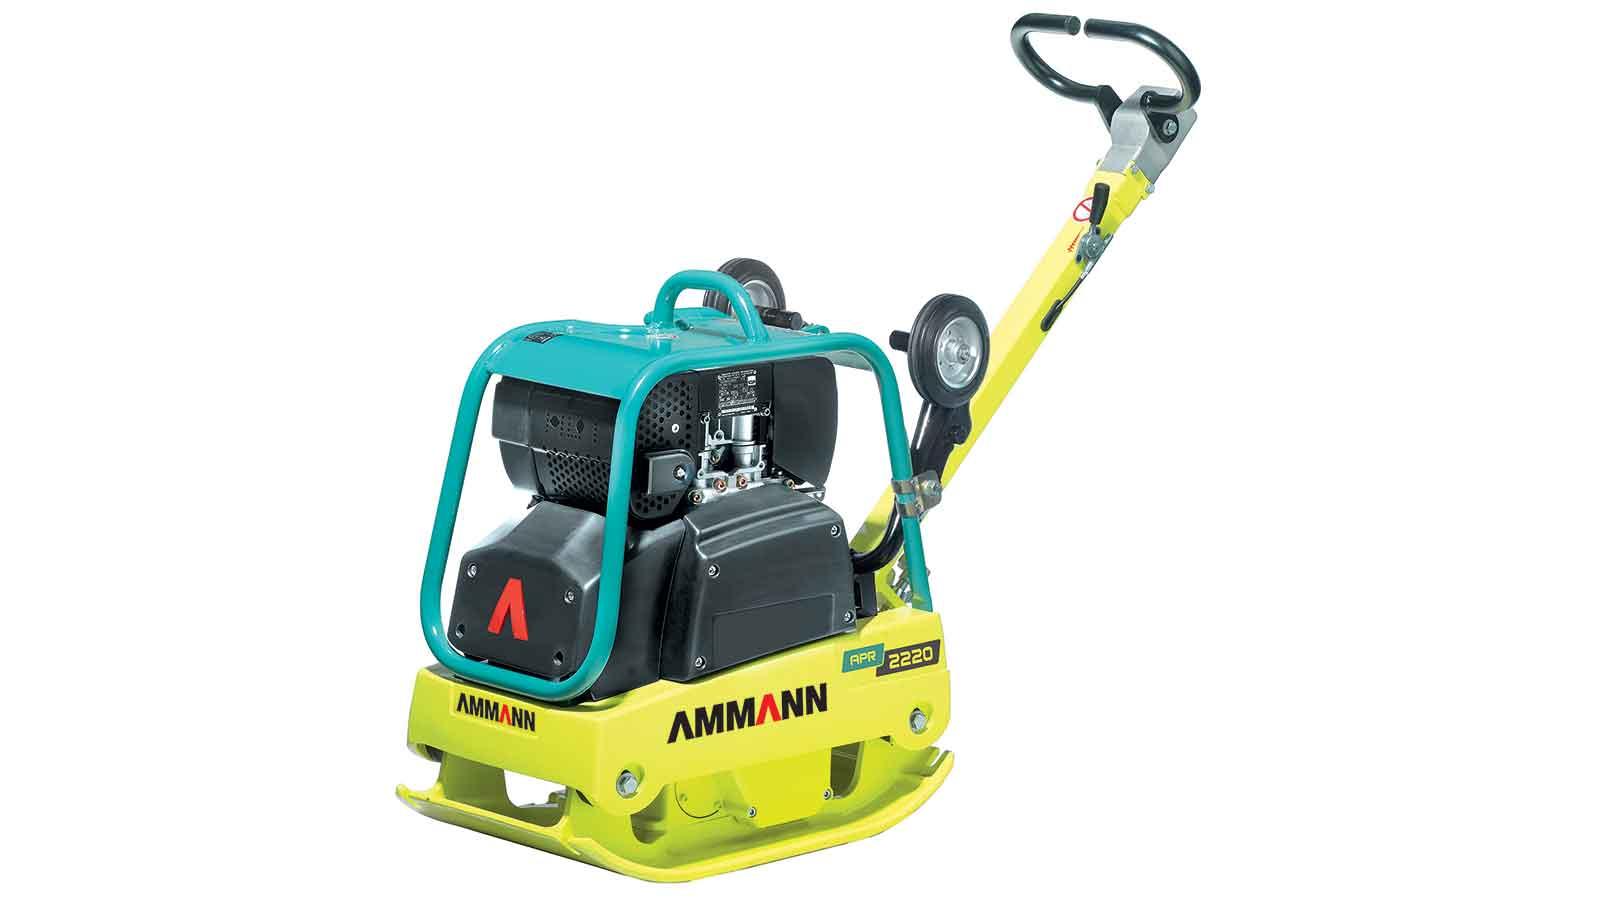 Vibrationsplatte AMMANN APR 2220 Diesel